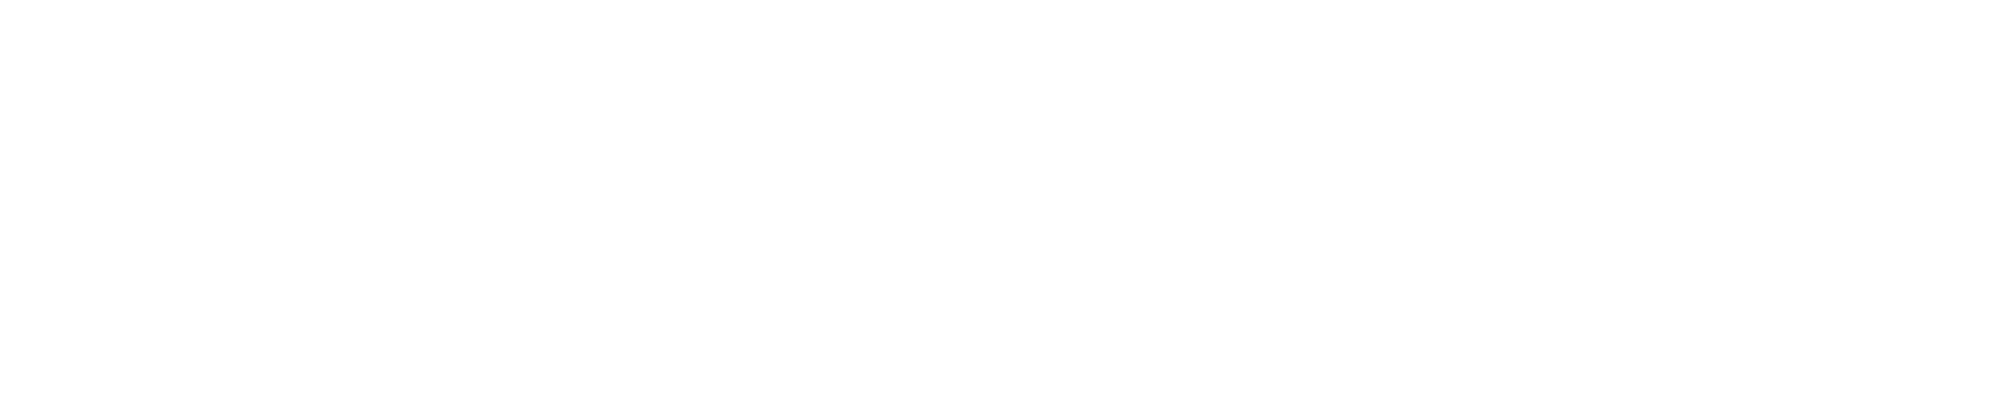 Reinforce Lab Ltd